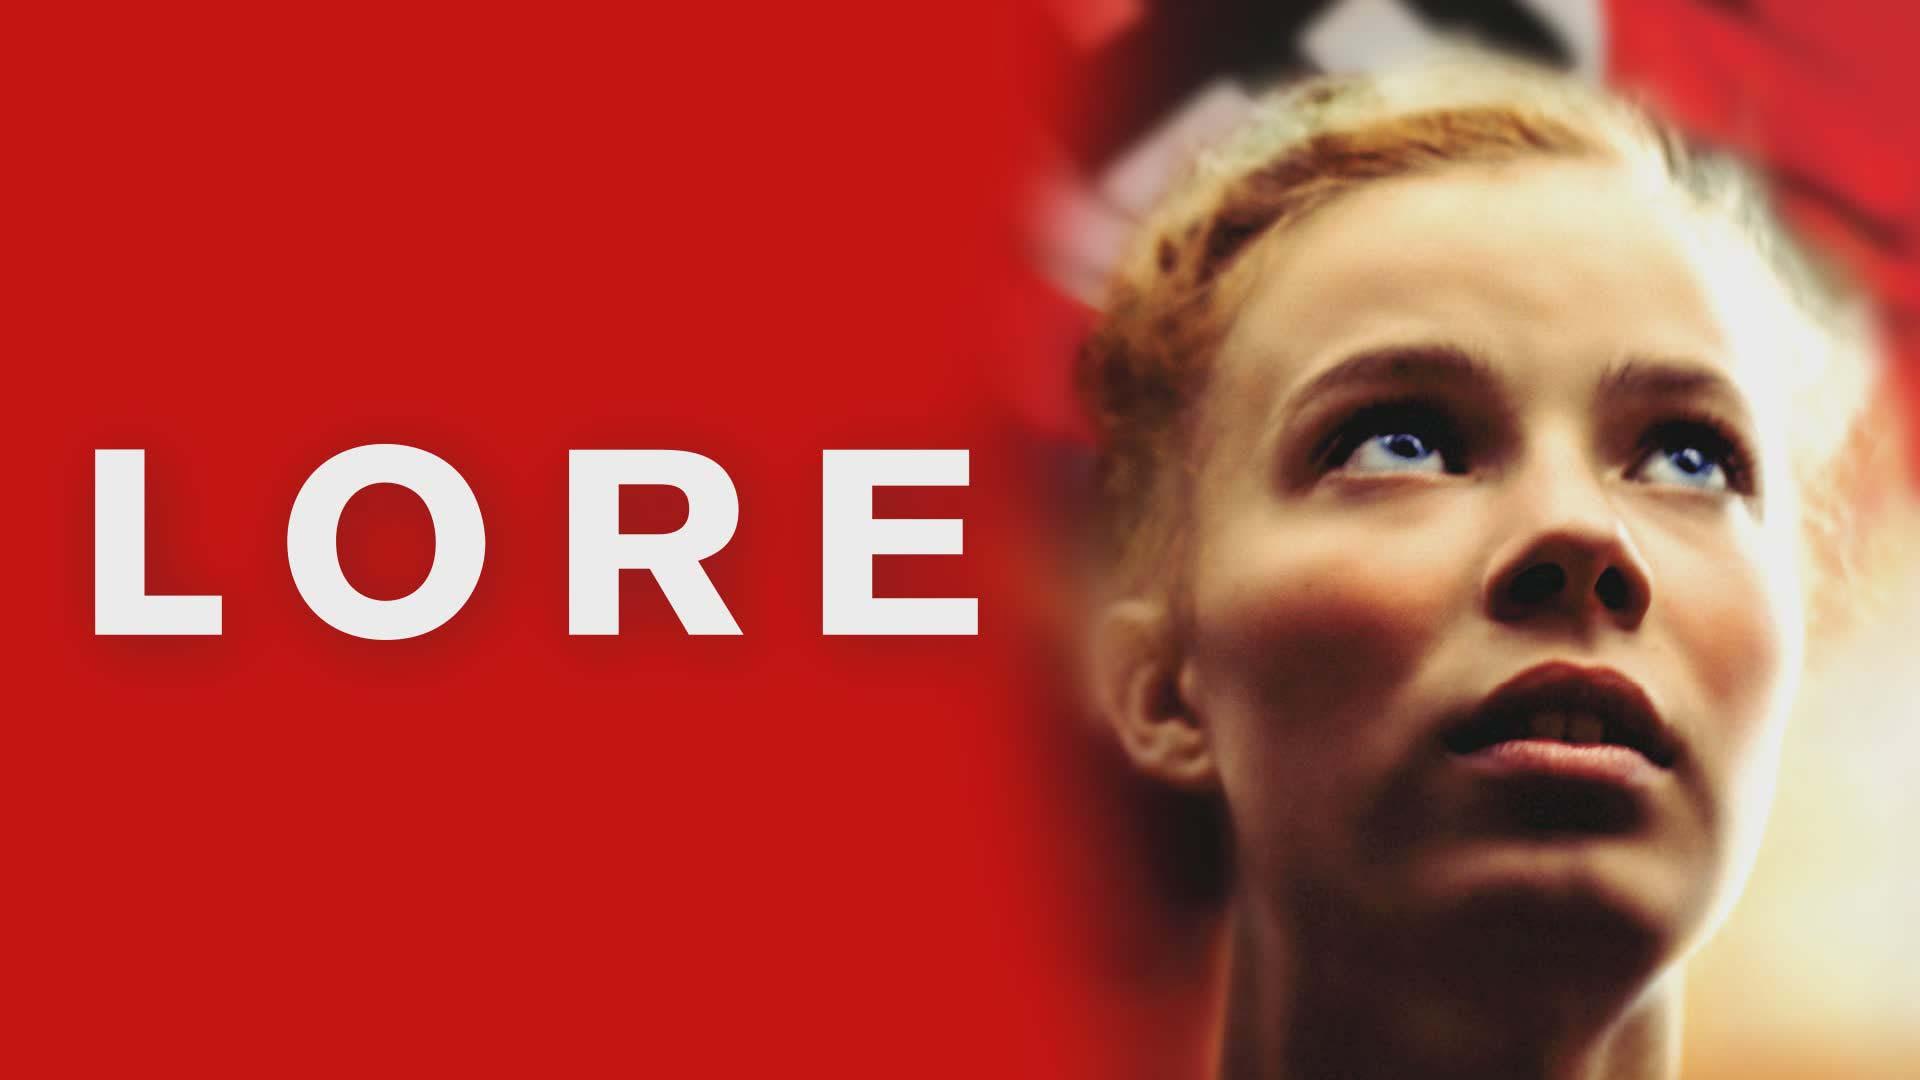 Lore - image